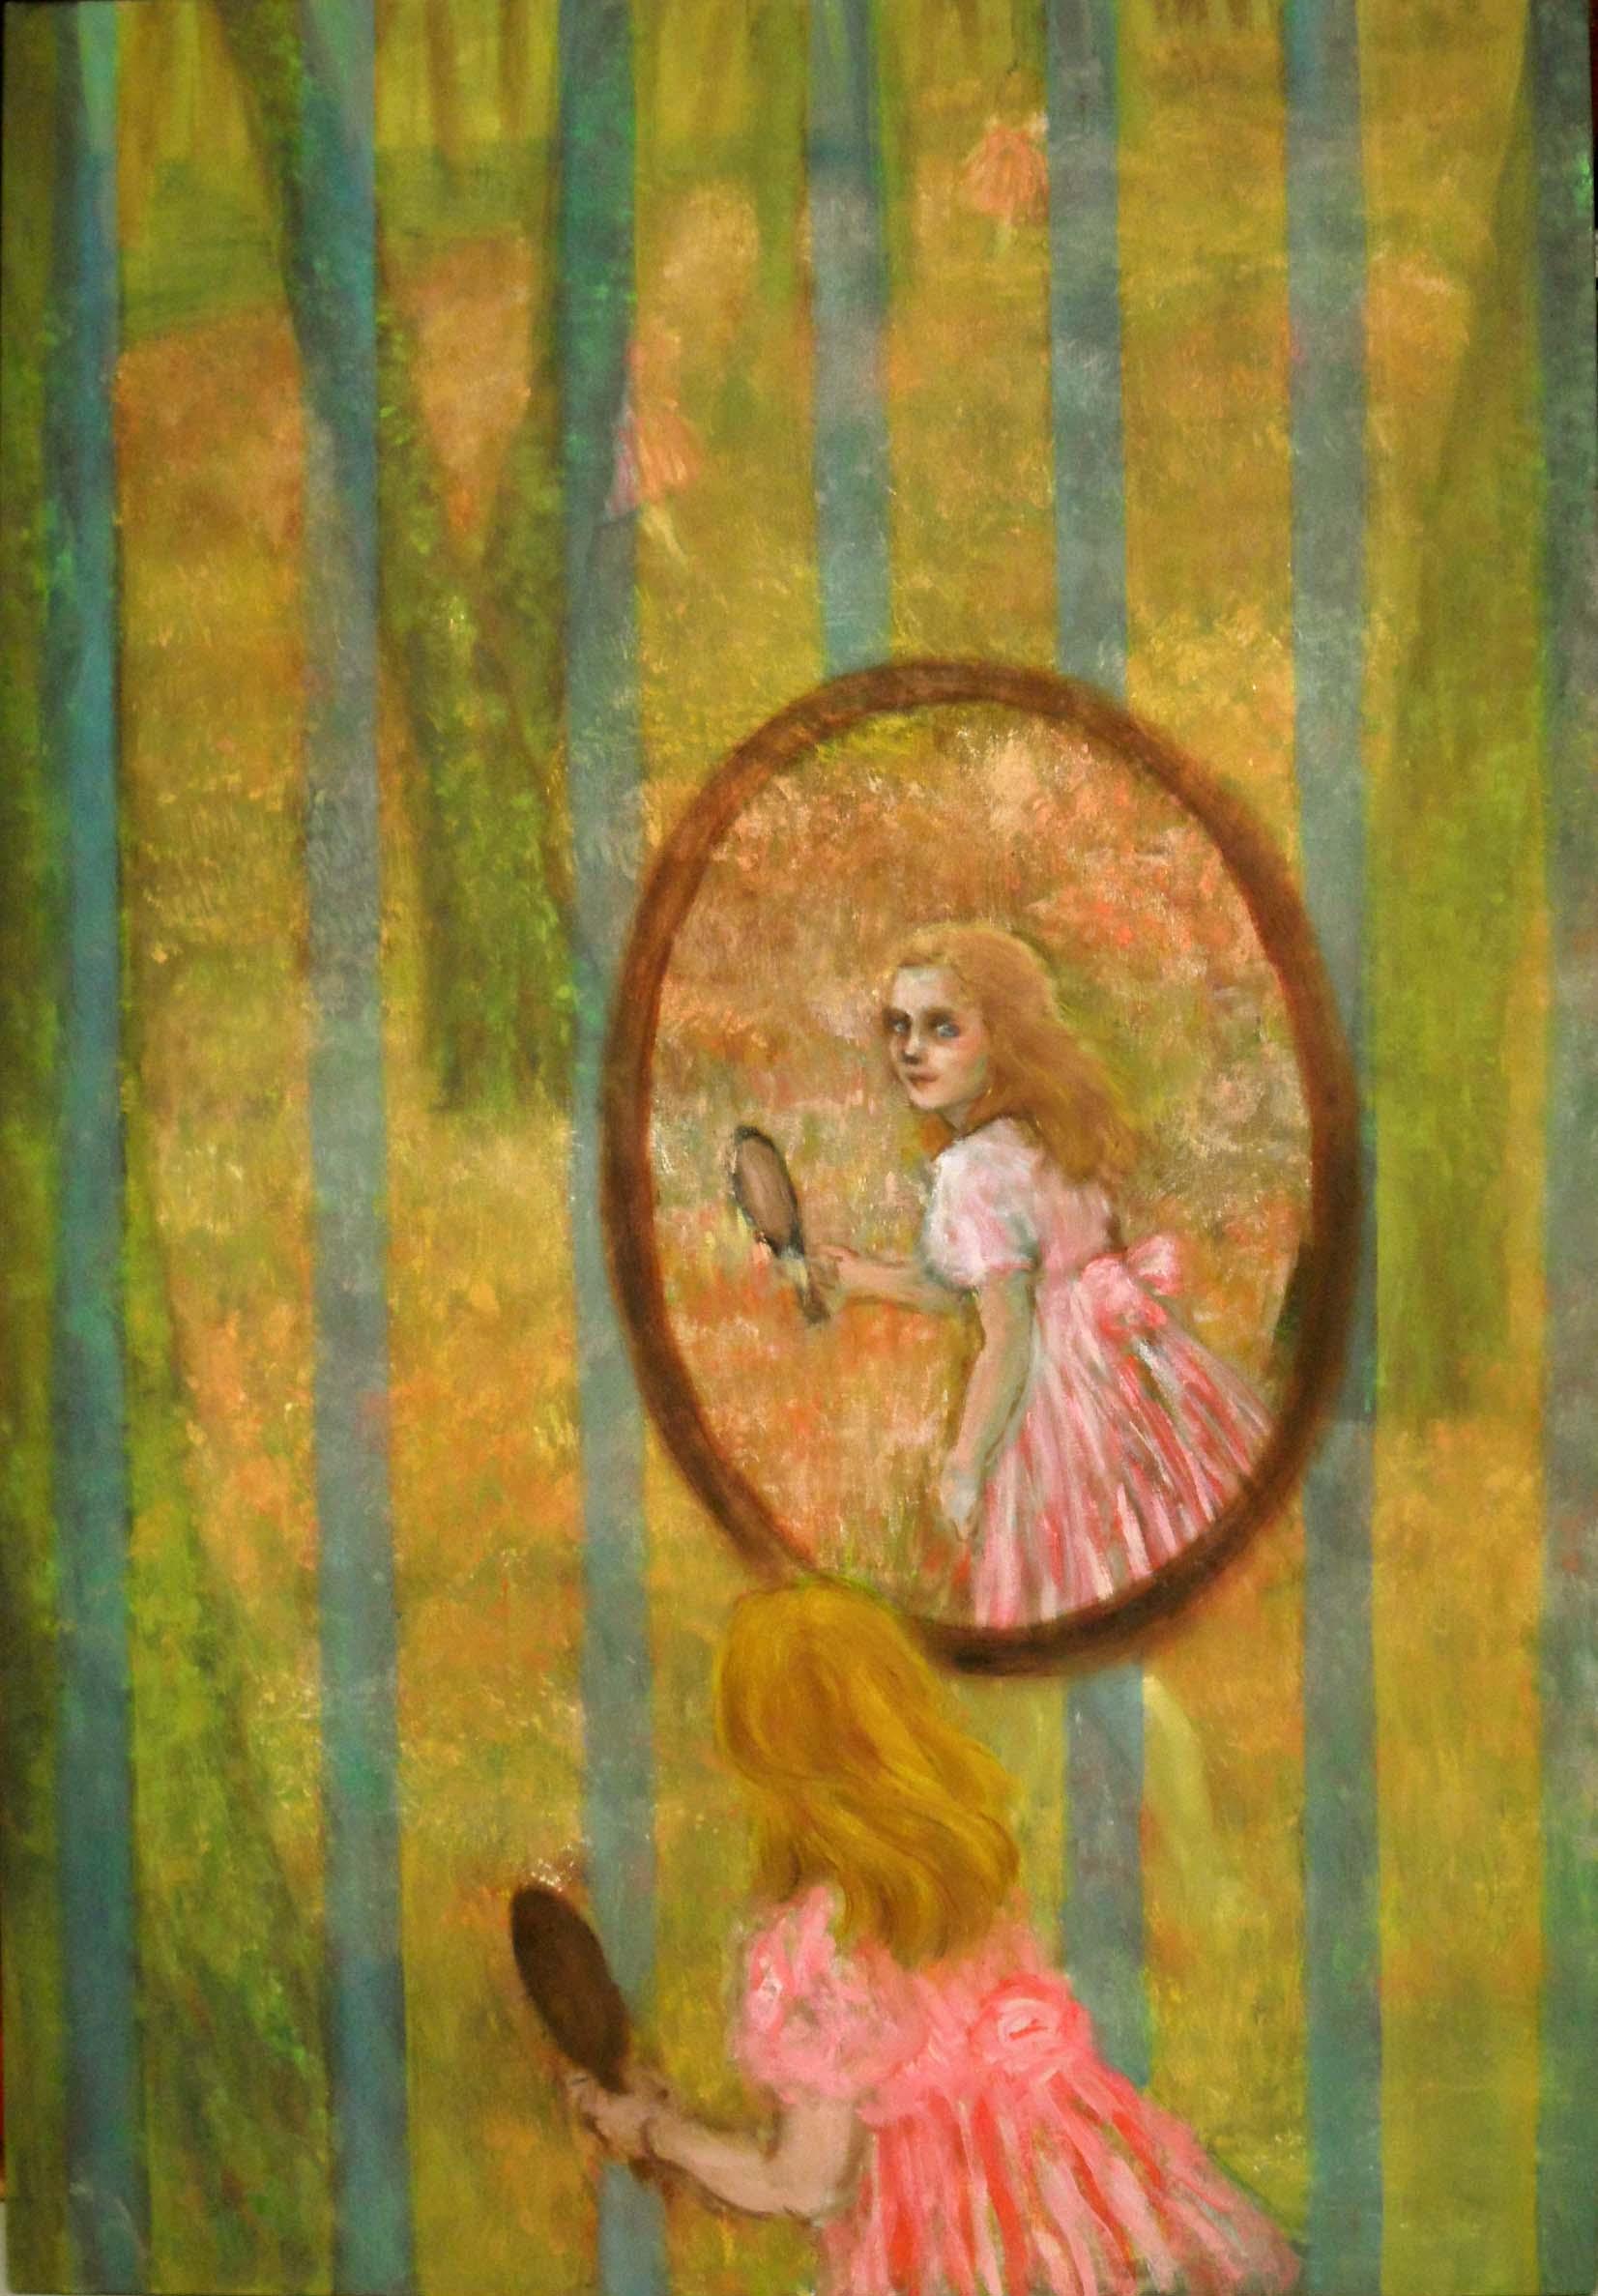 Forest in mirror